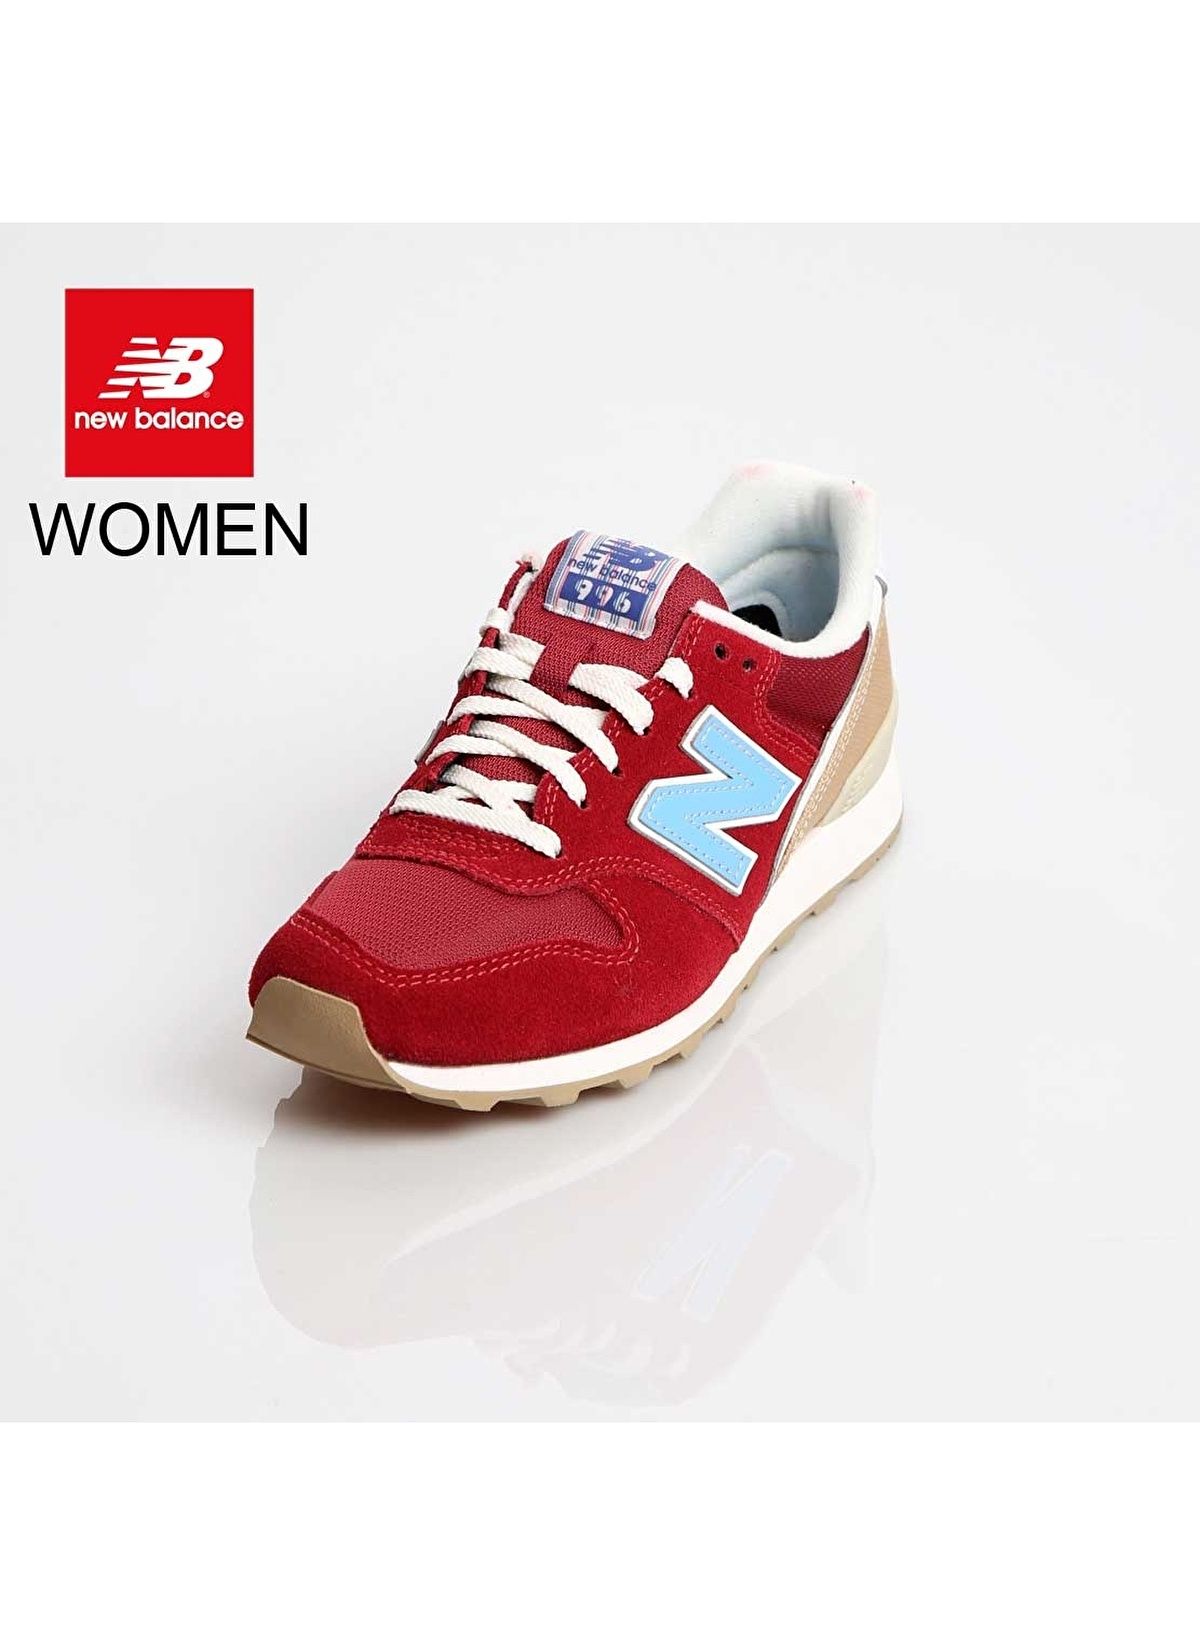 reputable site ed08d ae0d6 WR996HF-NB-Womens-Lifestyle